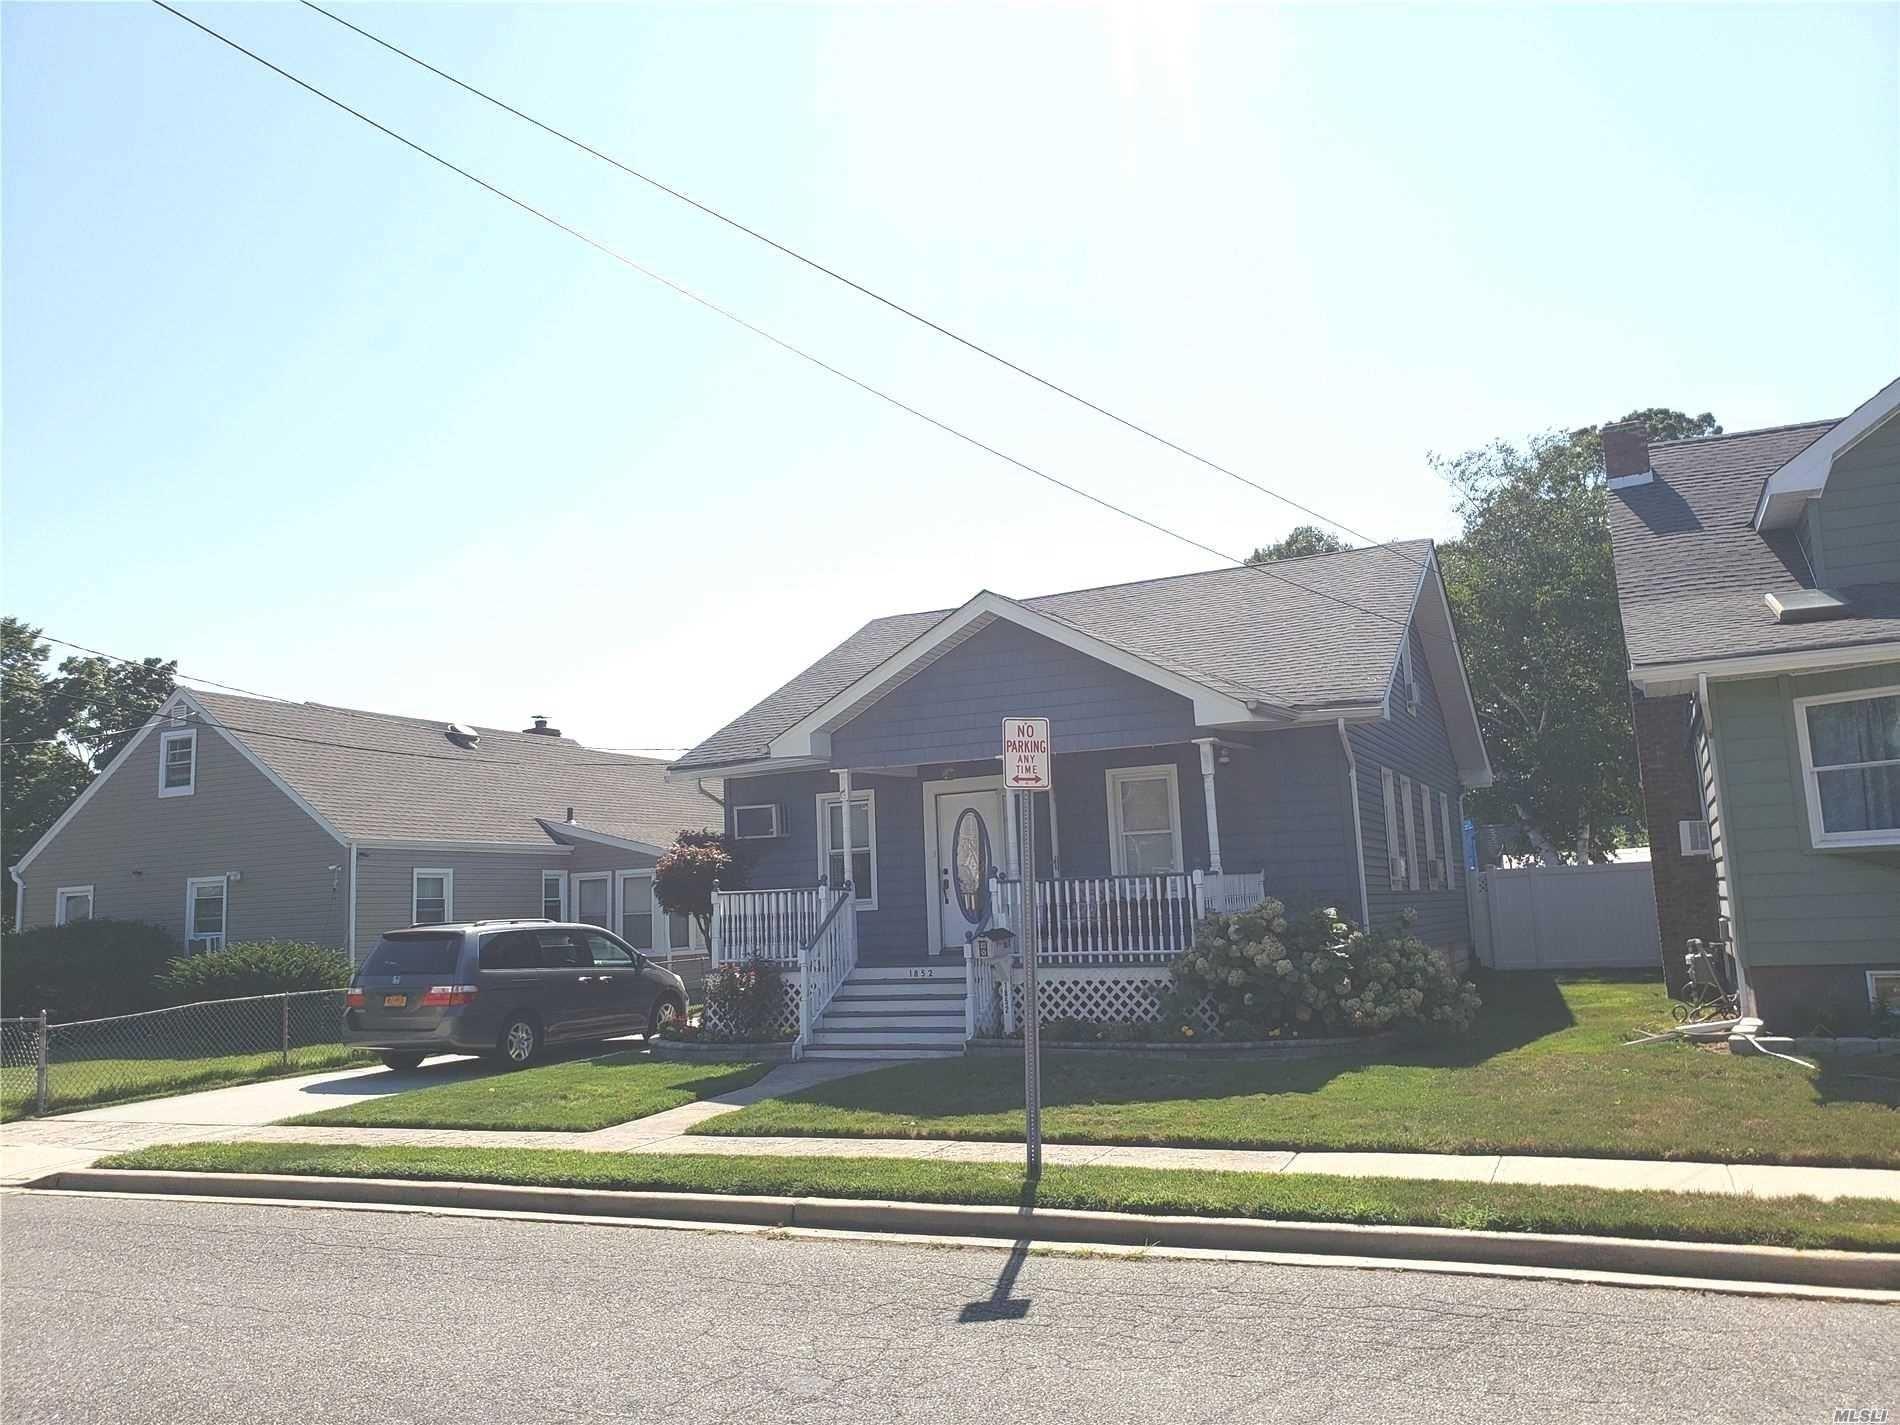 1852 Fargo St, Baldwin, NY 11510 - MLS#: 3237689